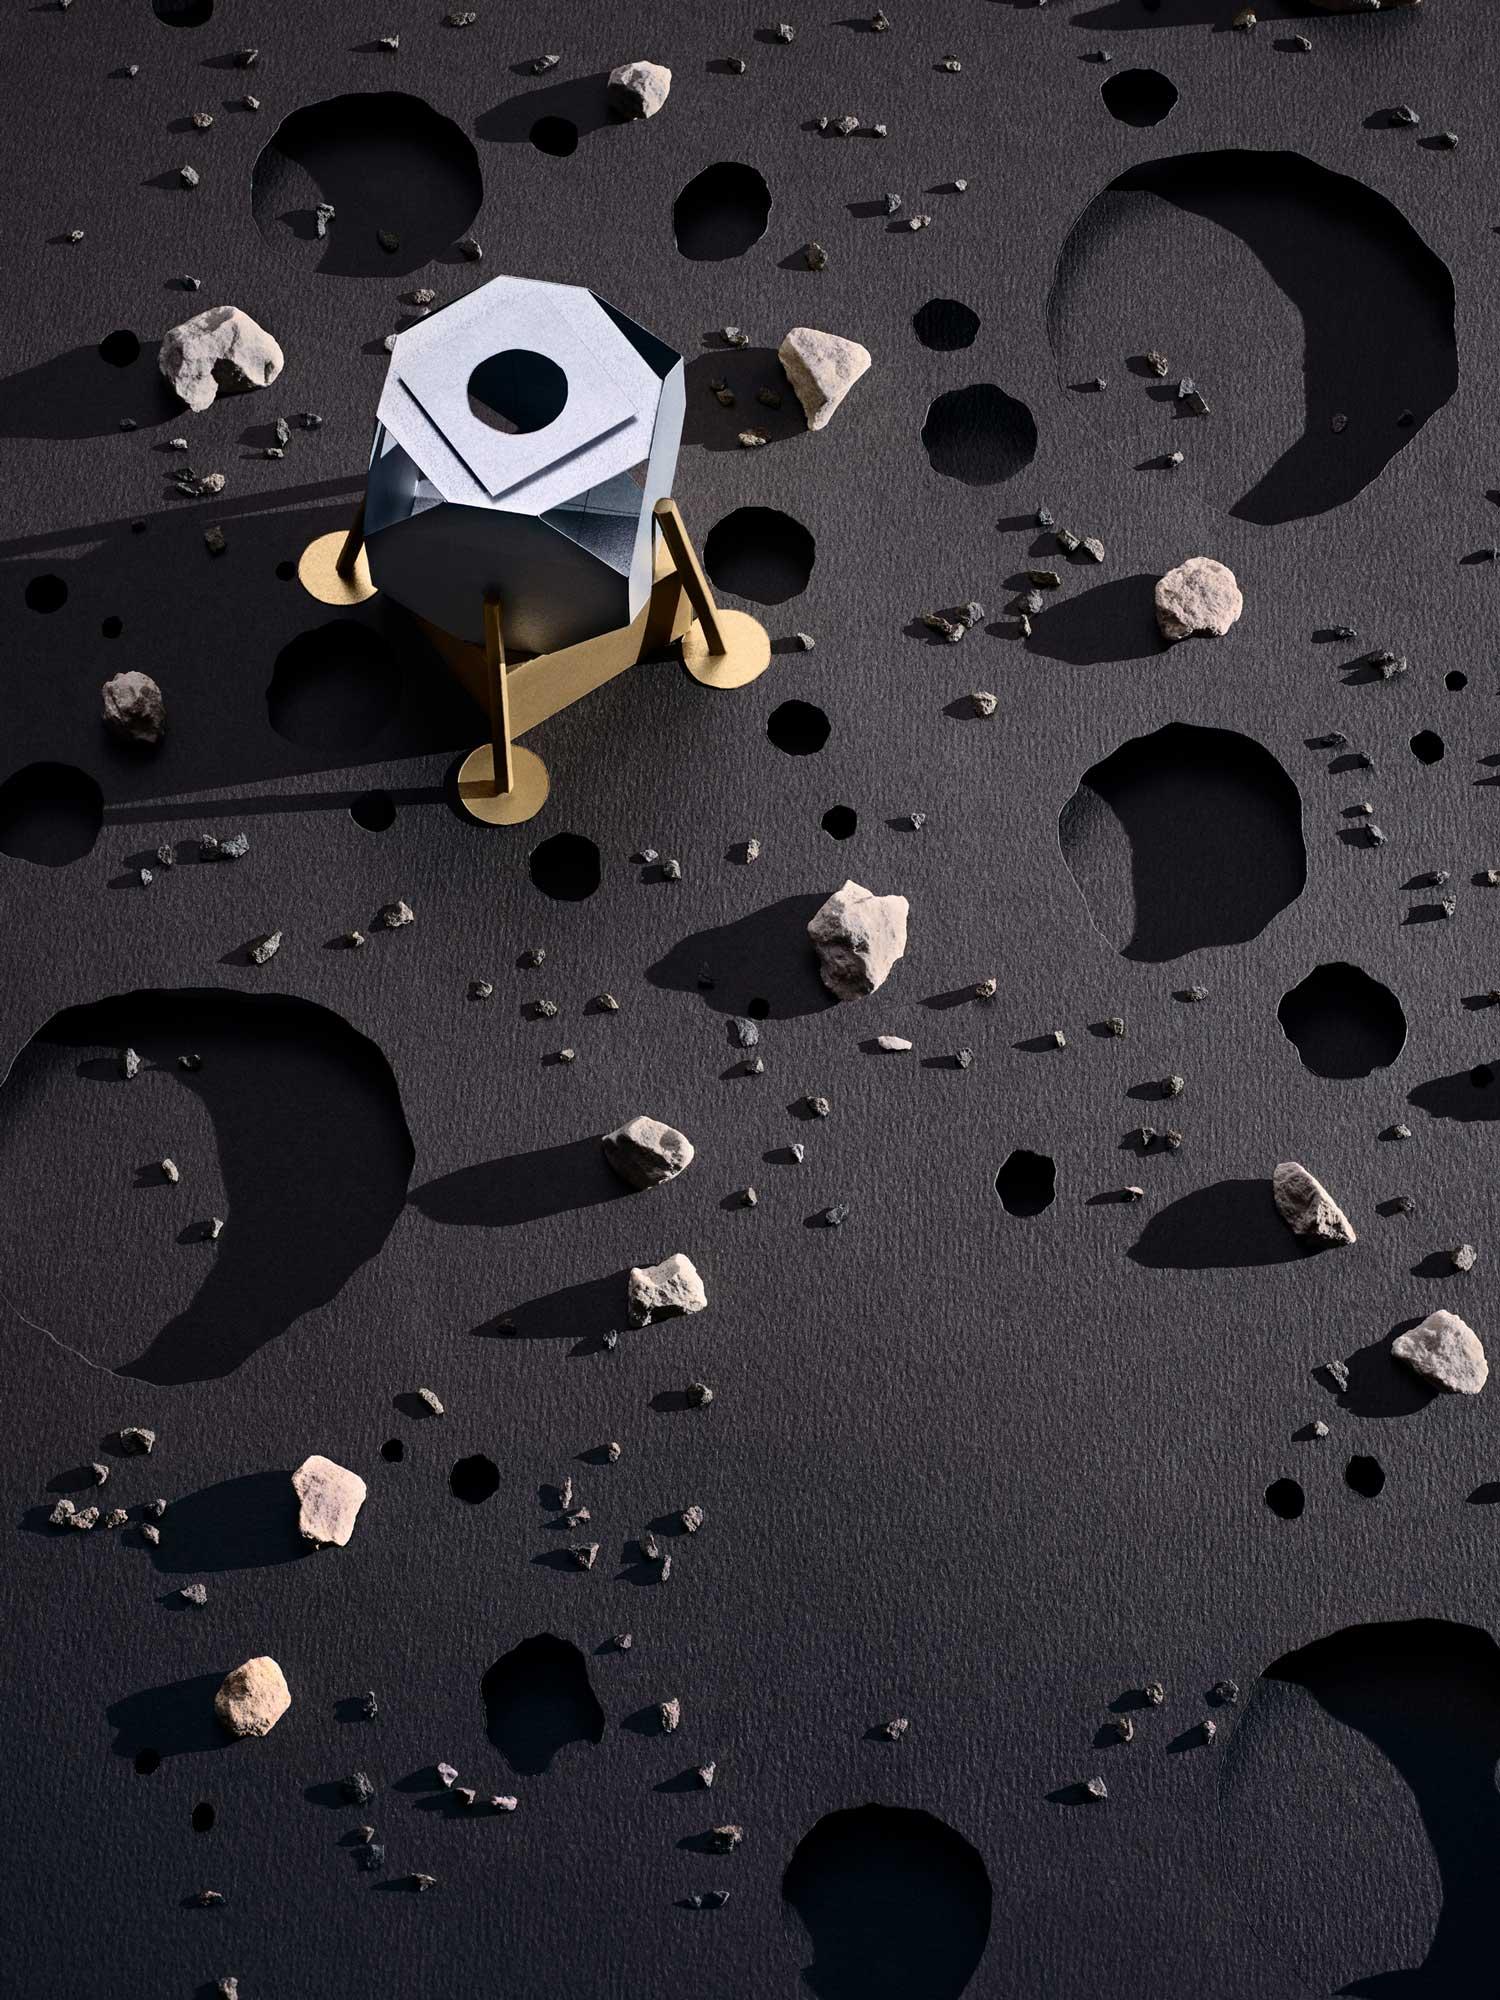 vanity fair celebrates the anniversary of Apollo 11 - magnus torsne / skarp photography